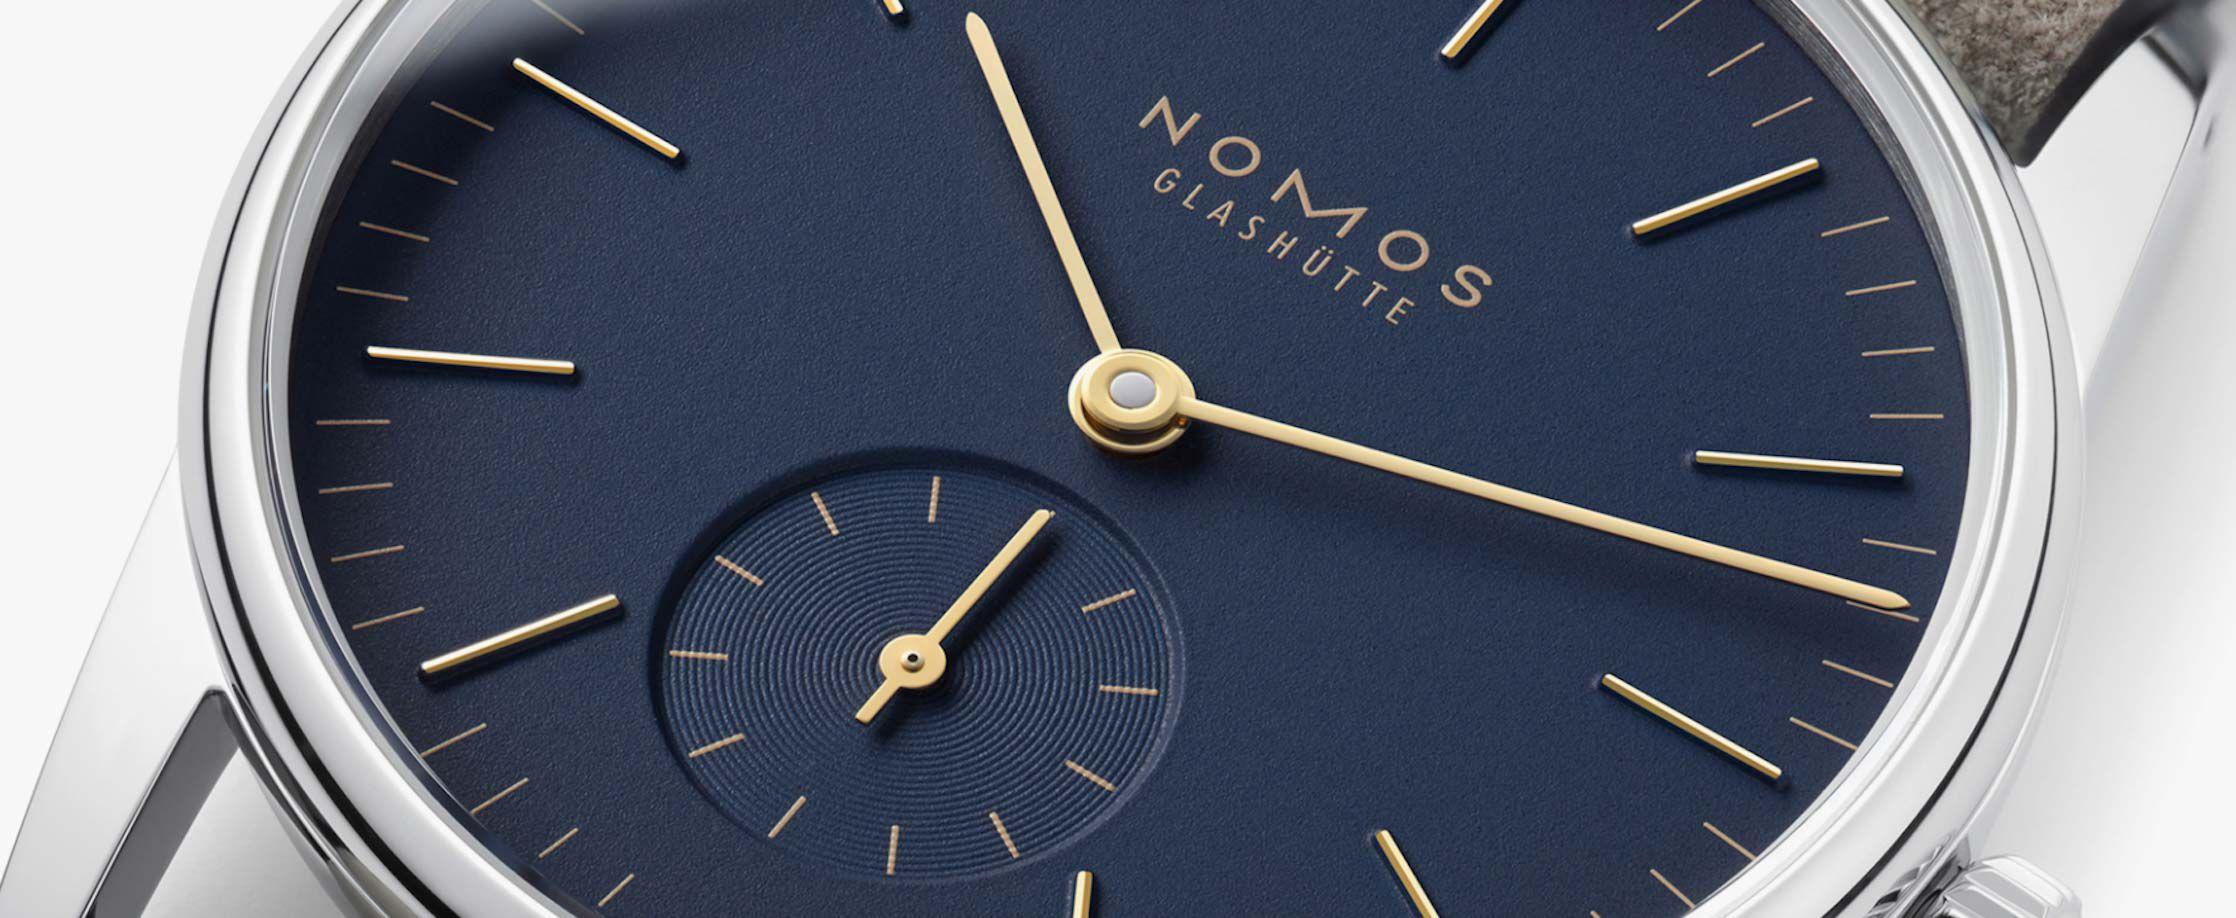 ORION系列家族再添新成员 NOMOS正式发布ORION猎户座38毫米和33毫米两款腕表